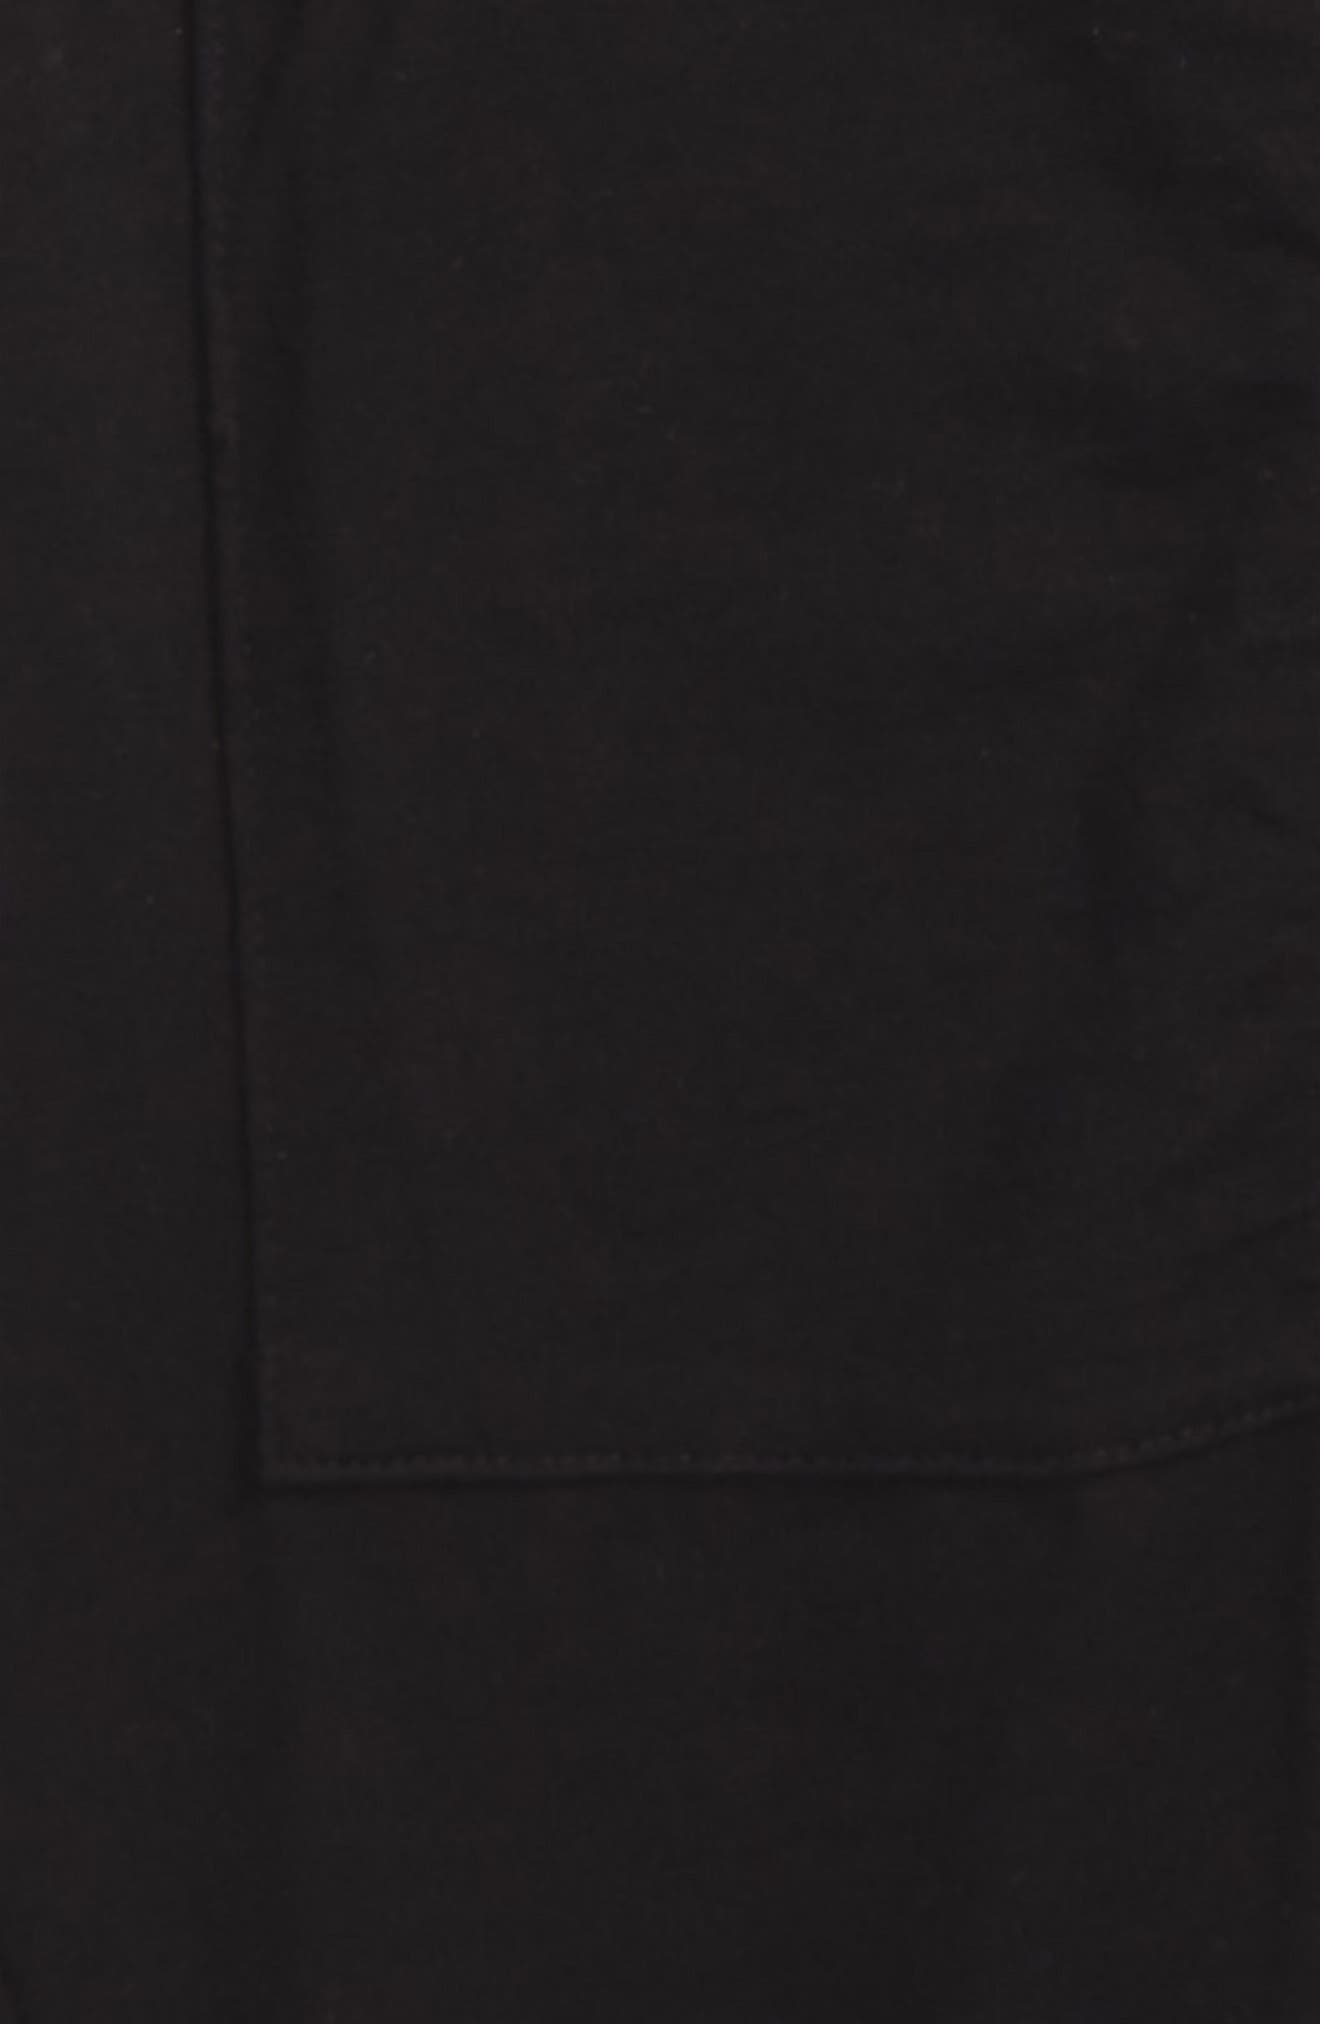 Maxi Short Sleeve Hoodie,                             Alternate thumbnail 2, color,                             Black